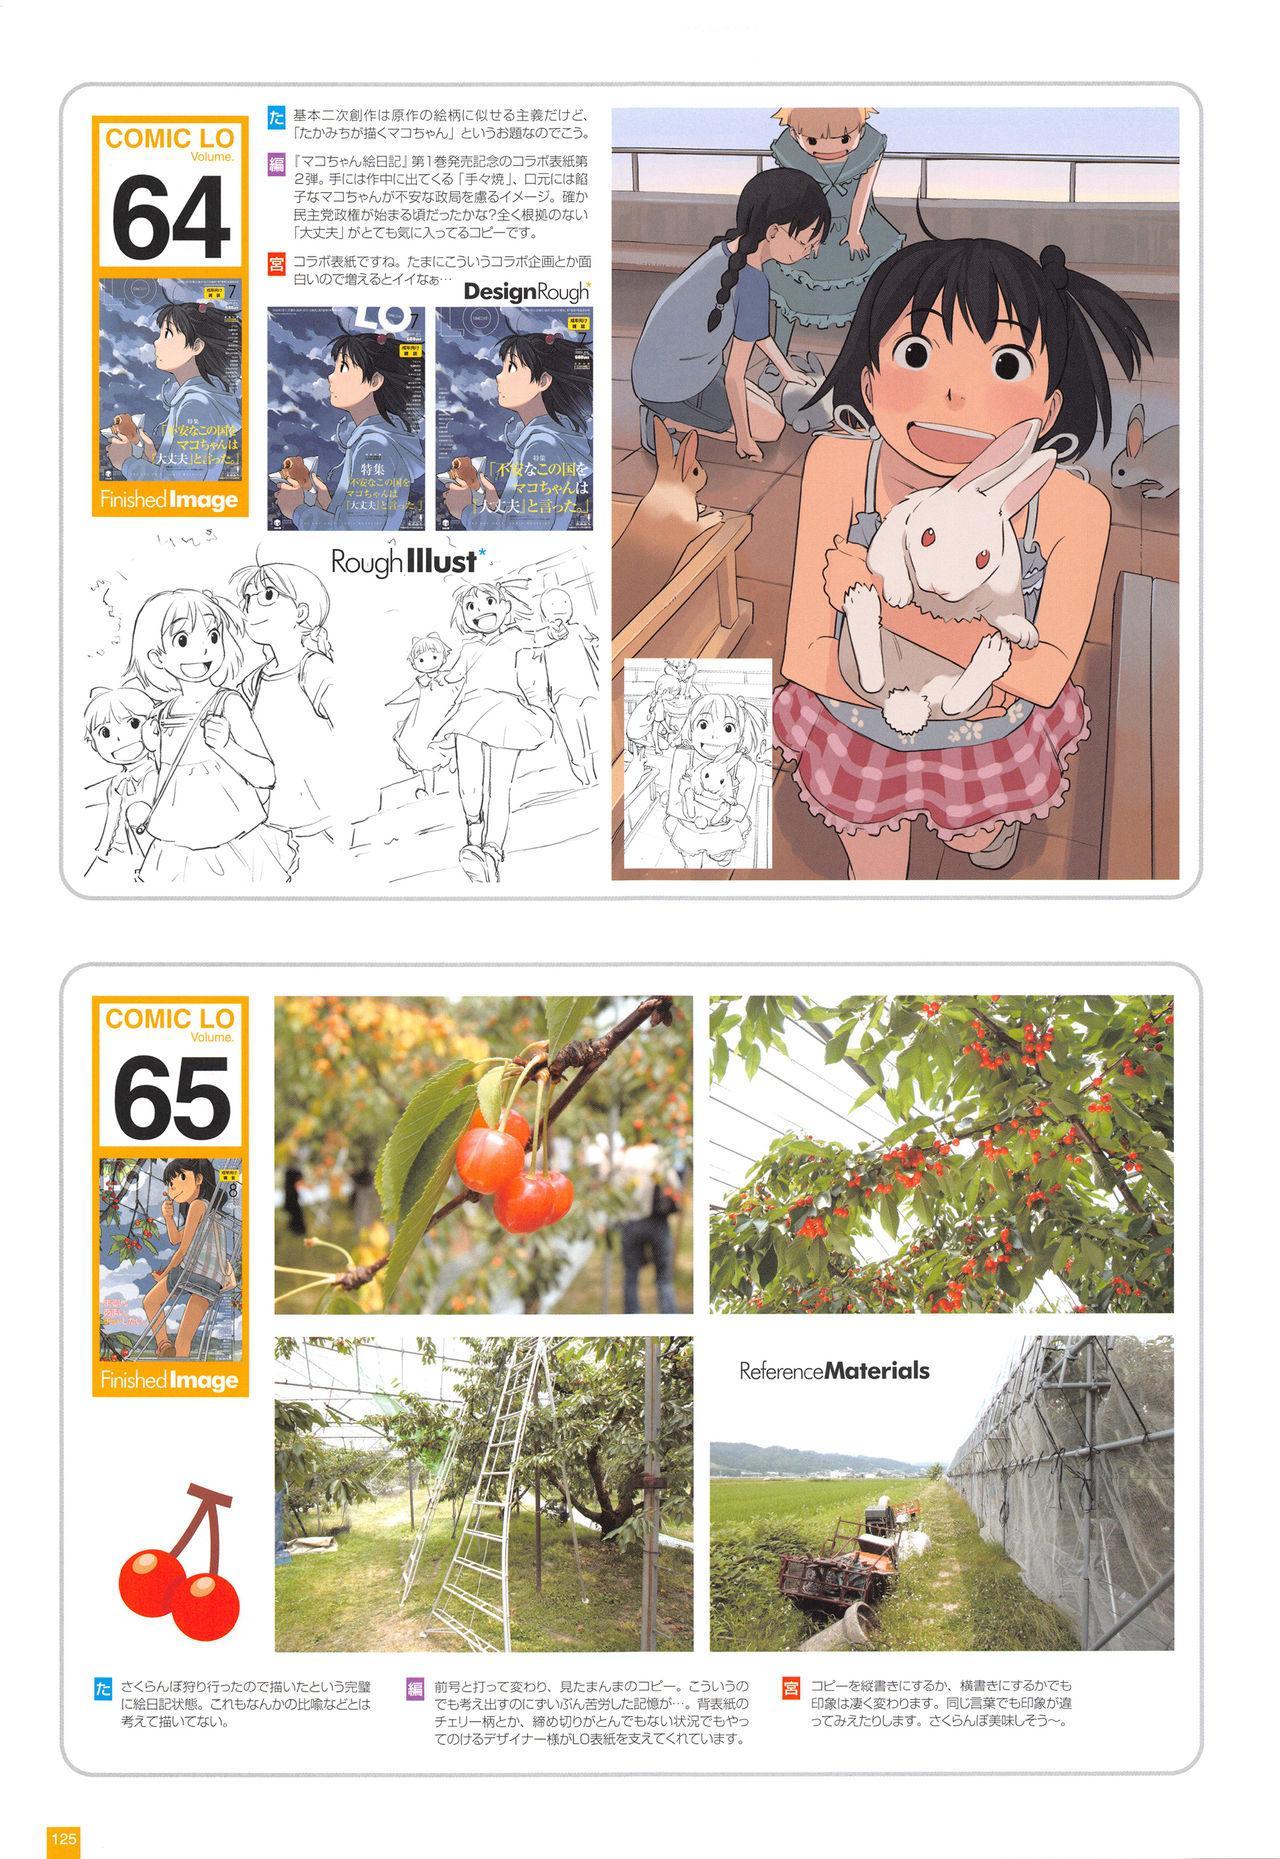 LO Artbook 2-A TAKAMICHI LOOP WORKS 127